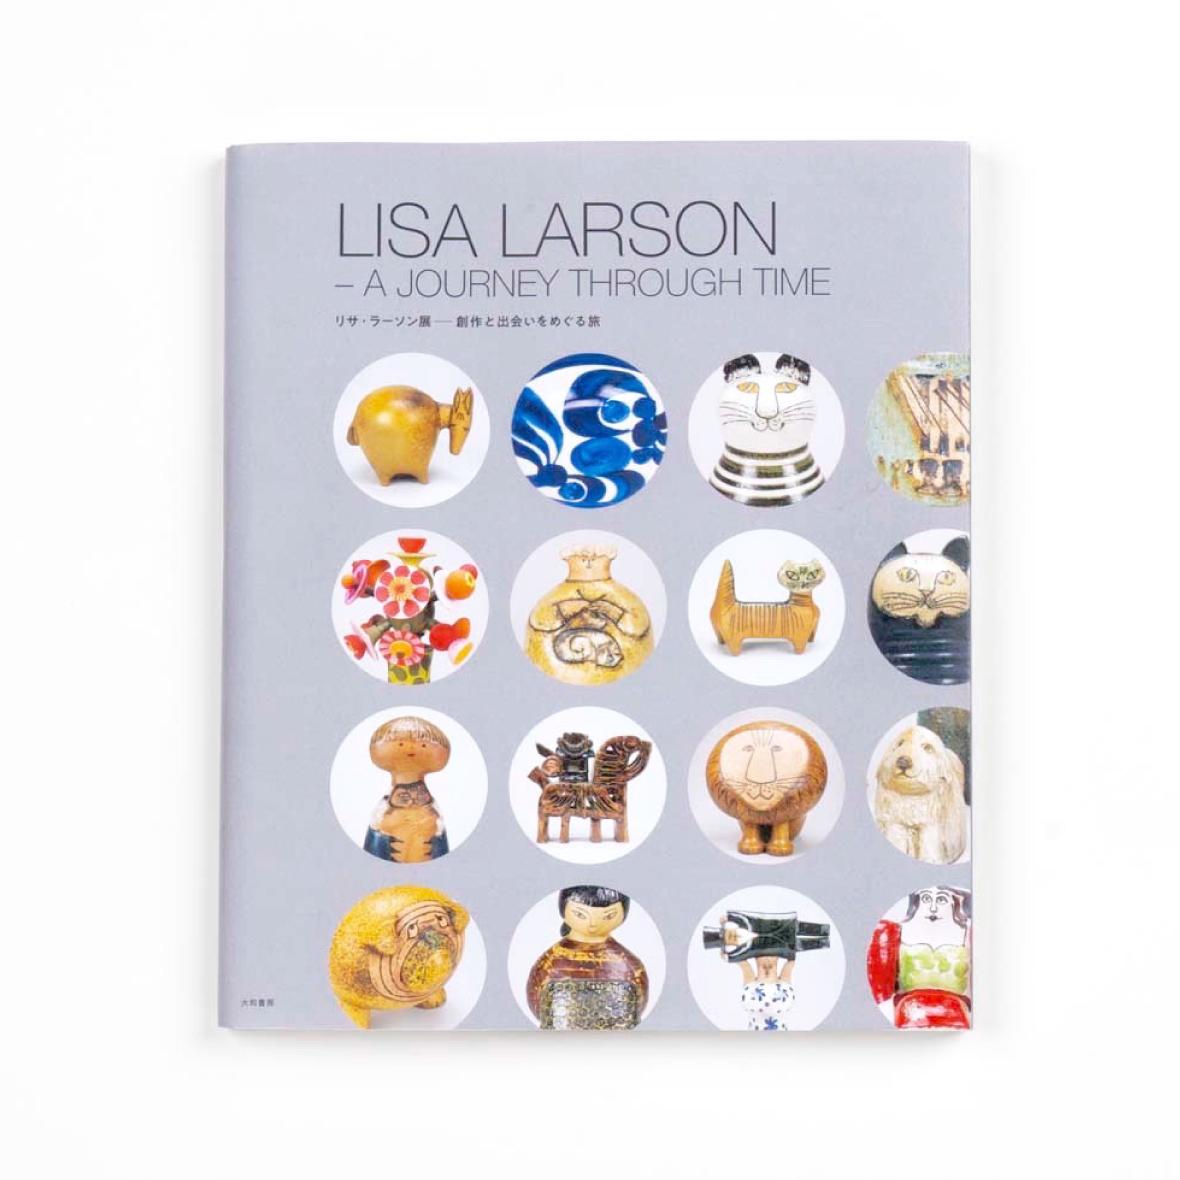 【TK】ヨハンナ・ラーソンデザインによる展覧会公式図録